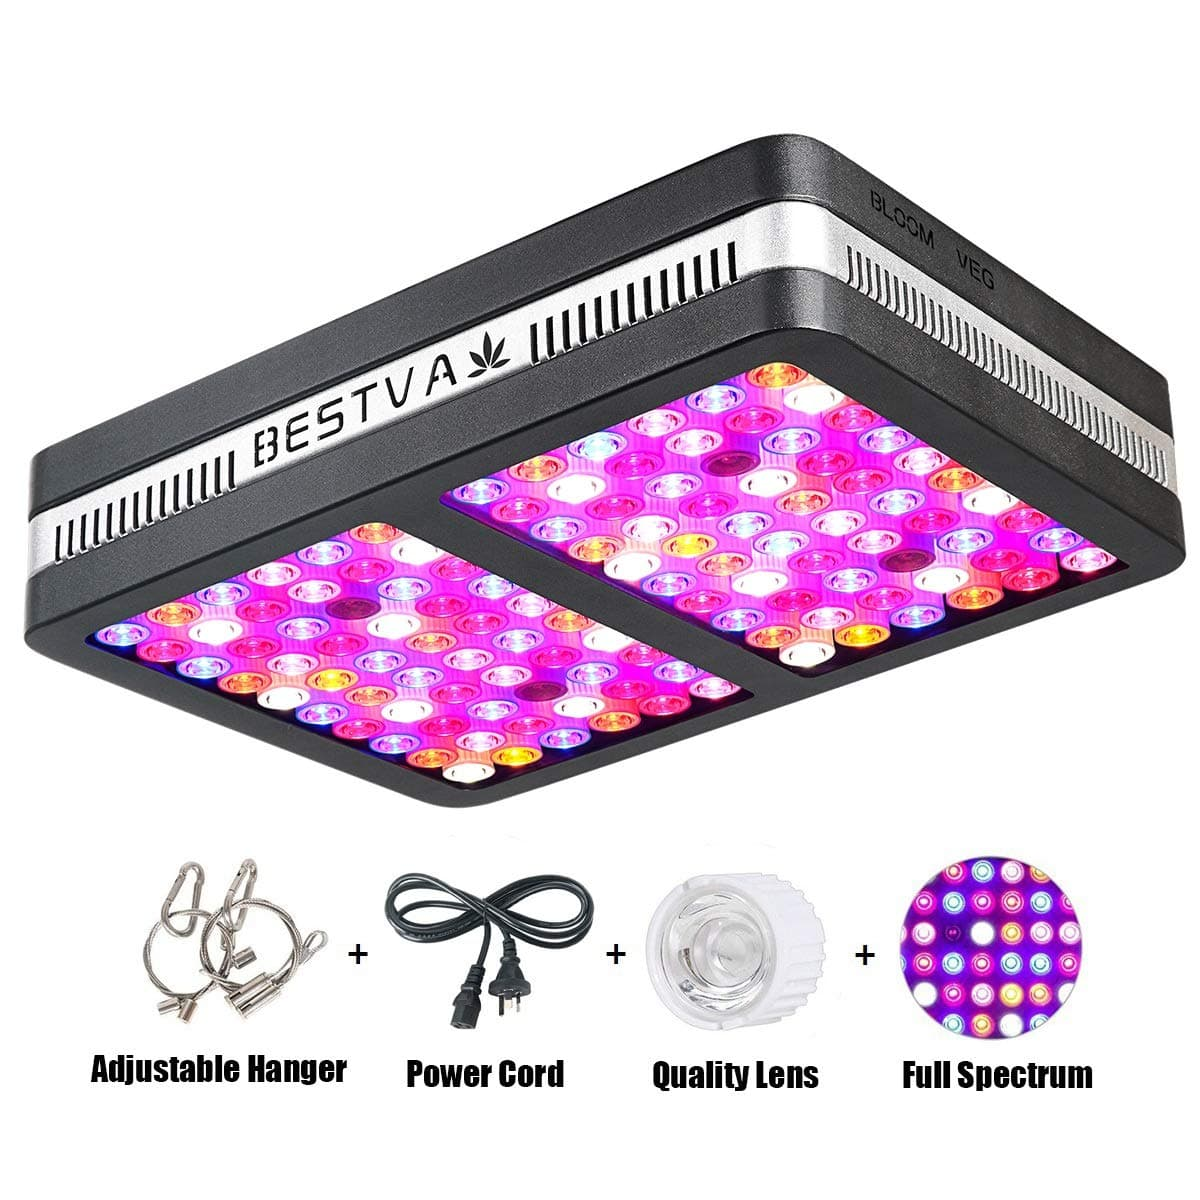 BESTVA Reflector Series 1200 Watt Led Lights